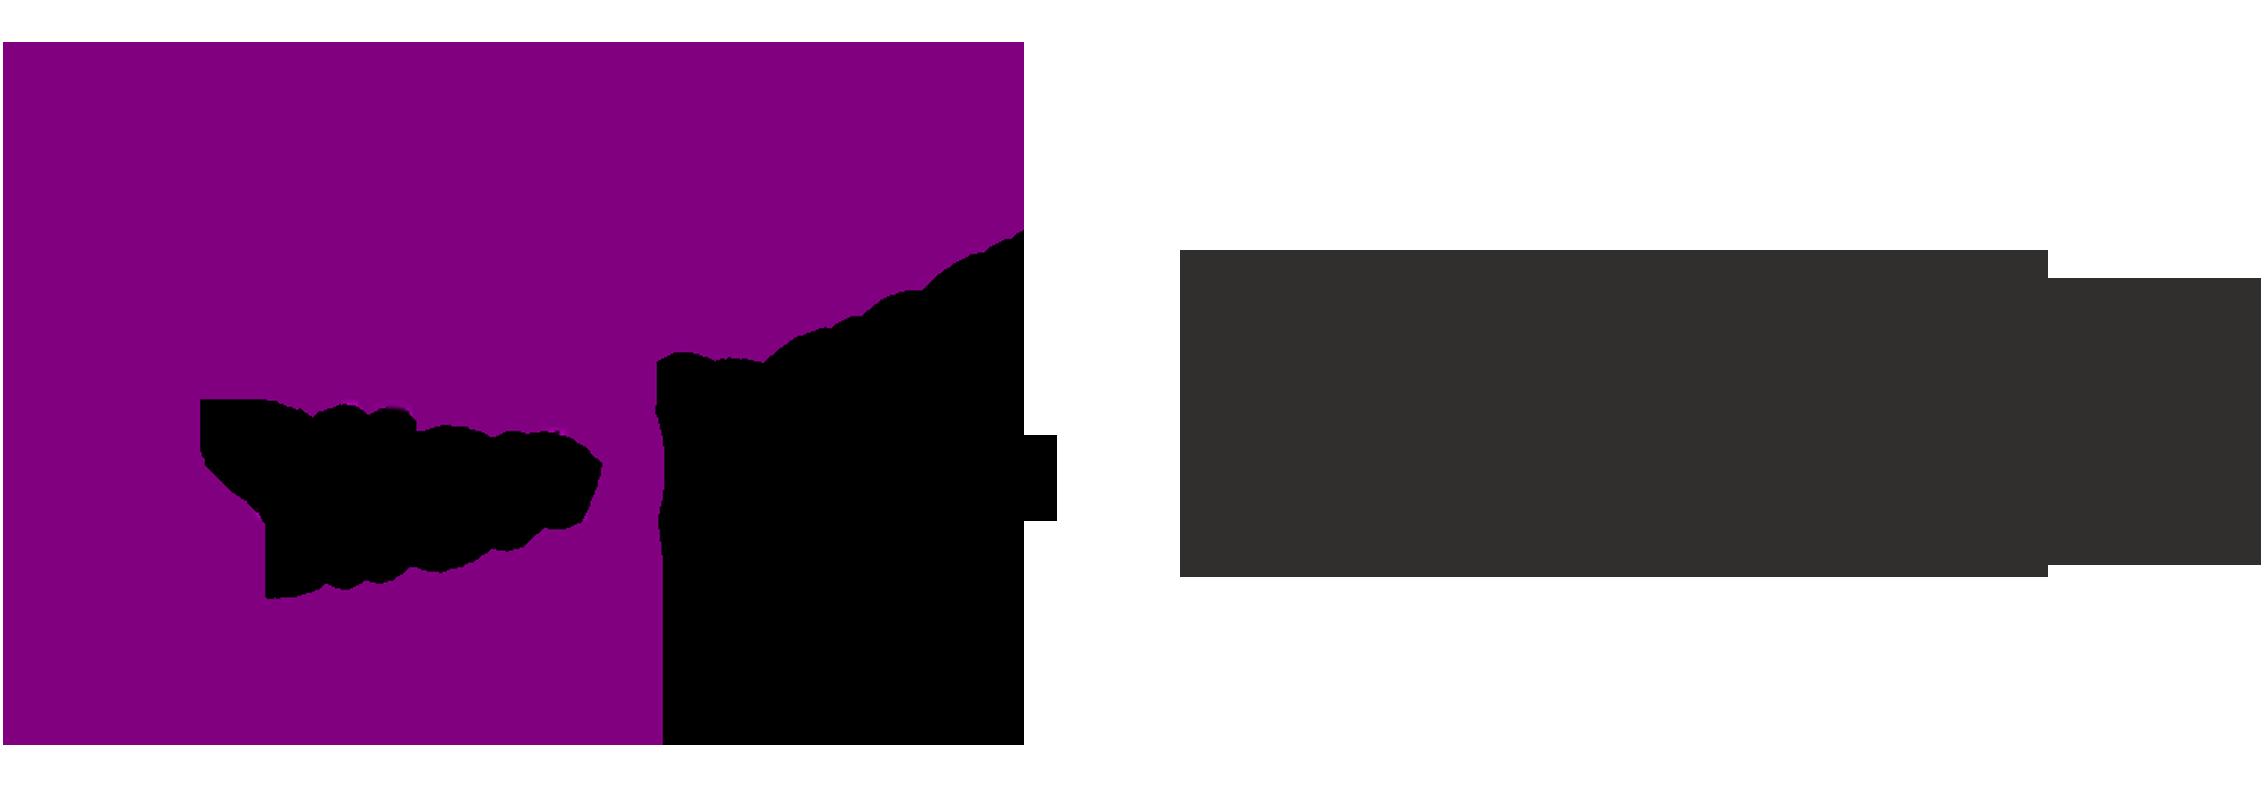 Seifenbasar Onlineshop-Logo